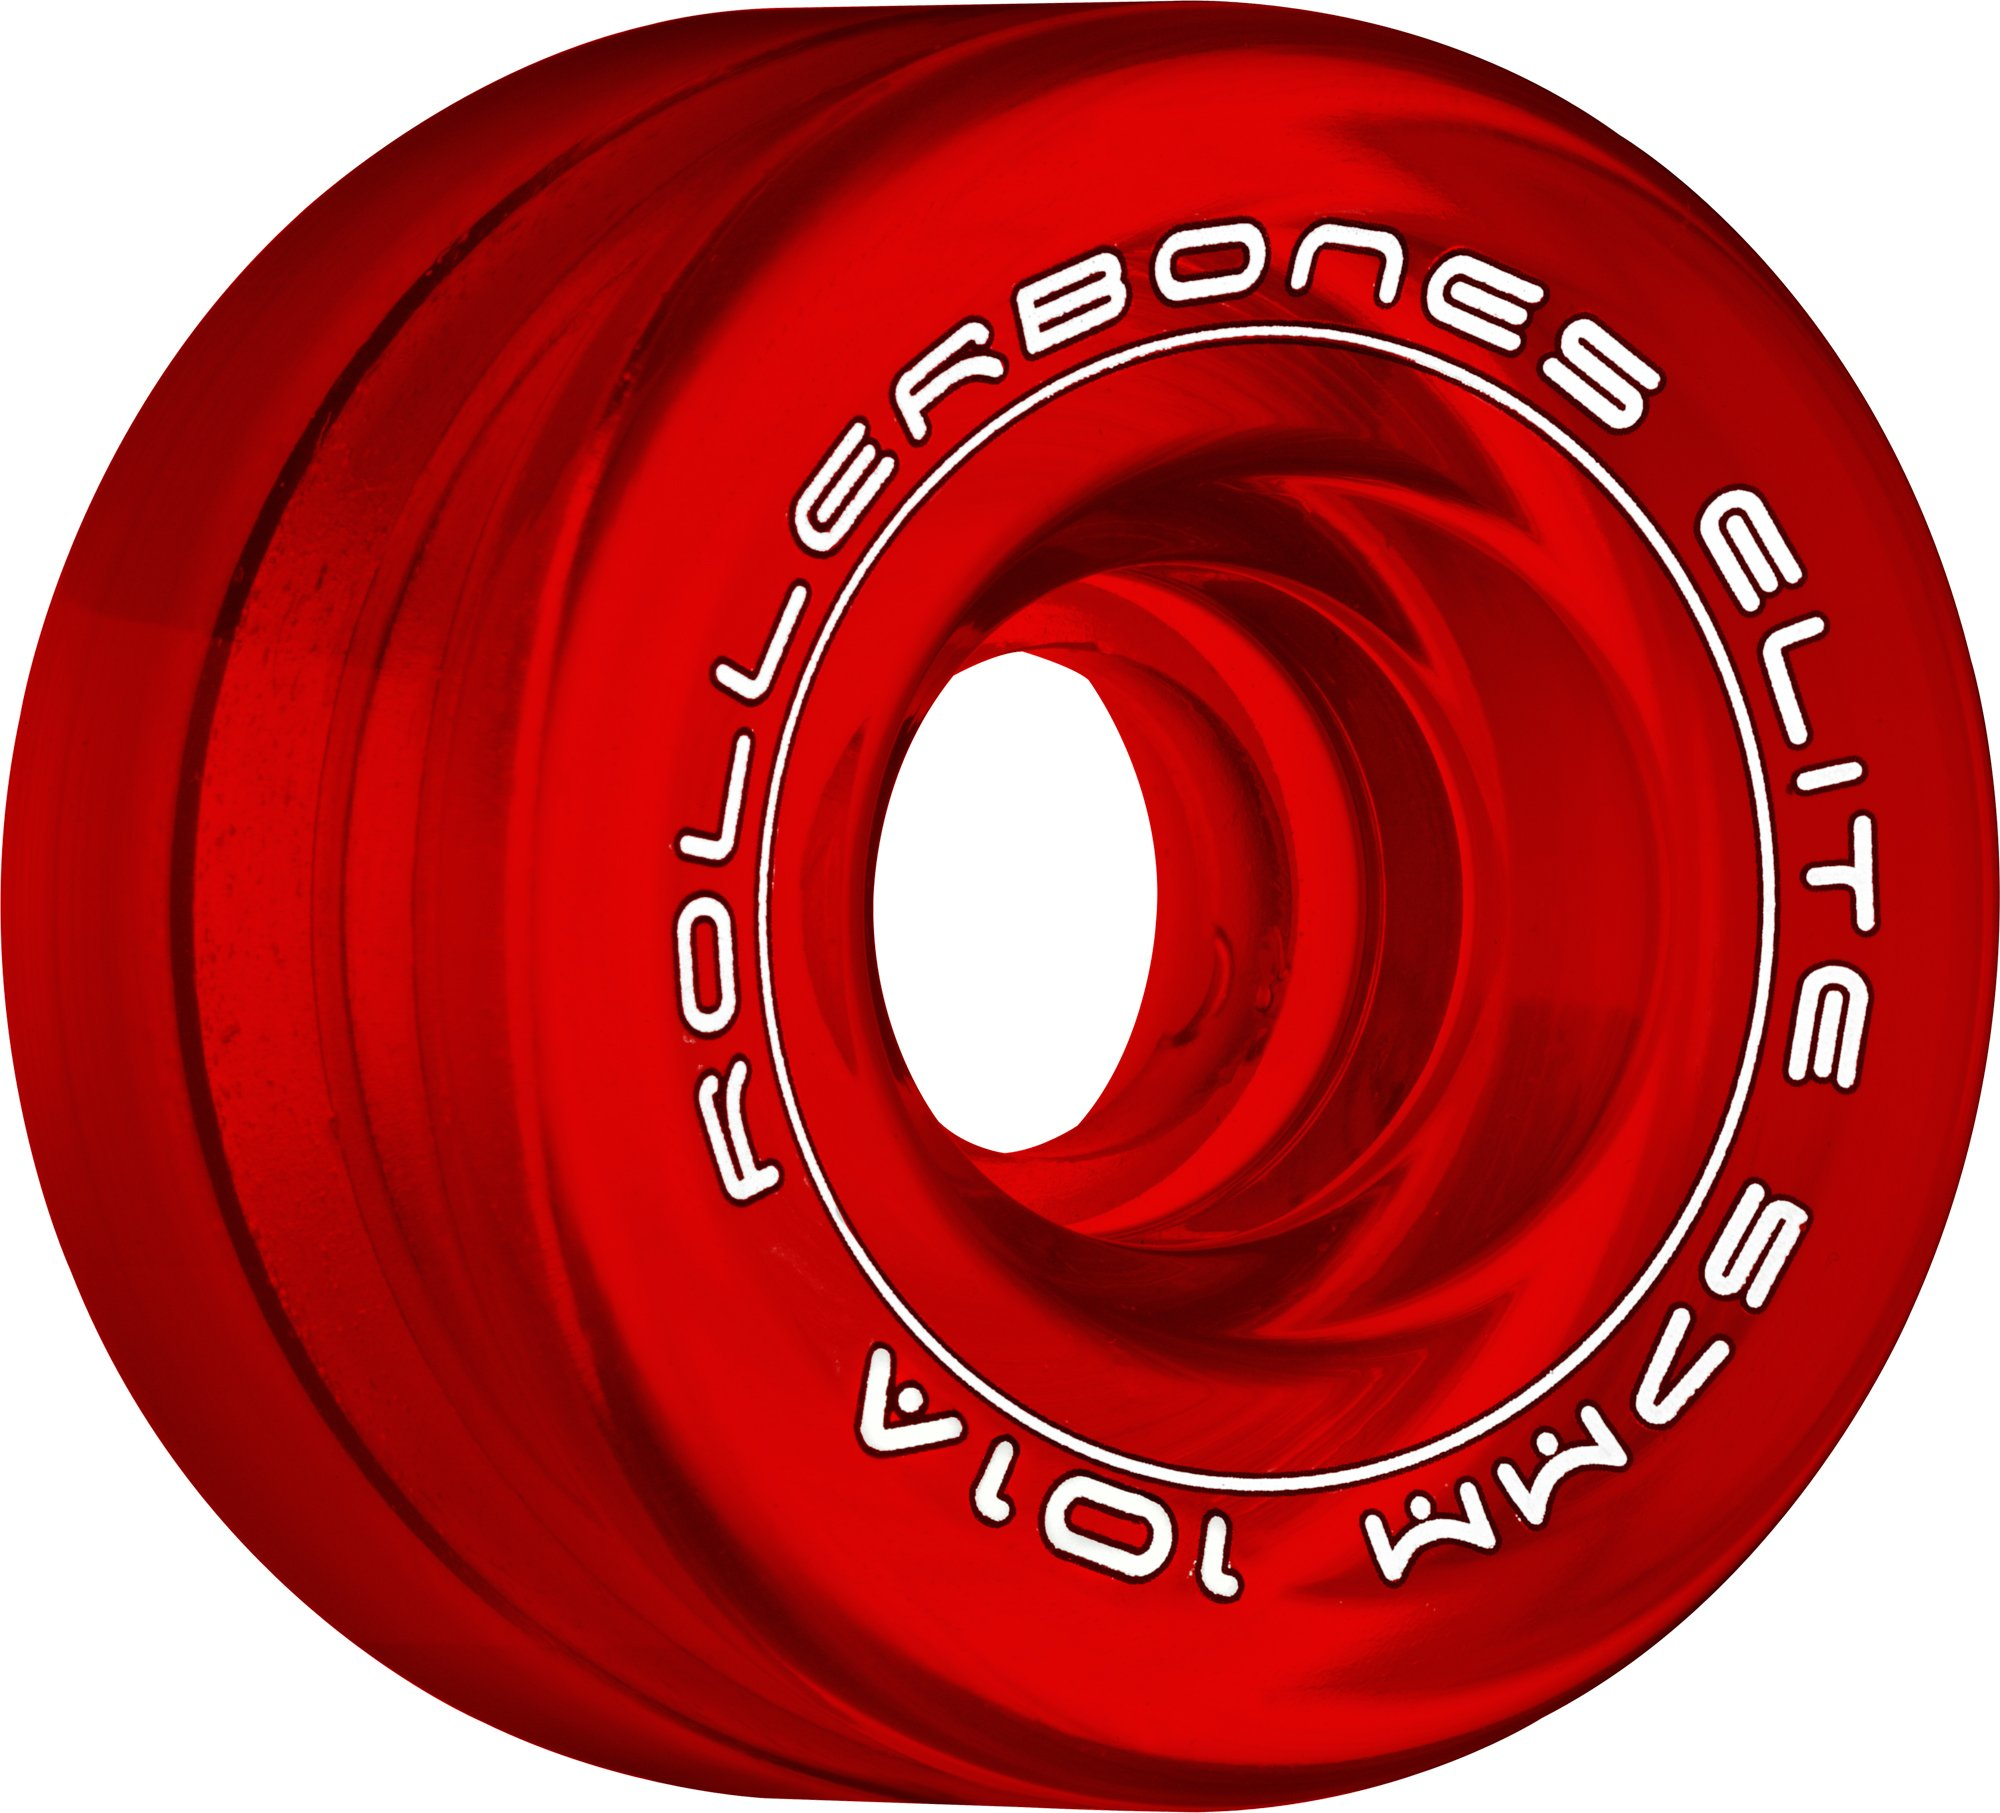 RollerBones Art Elite 101A Competition Roller Skate Wheels (Set of 8), Red, 57mm by RollerBones